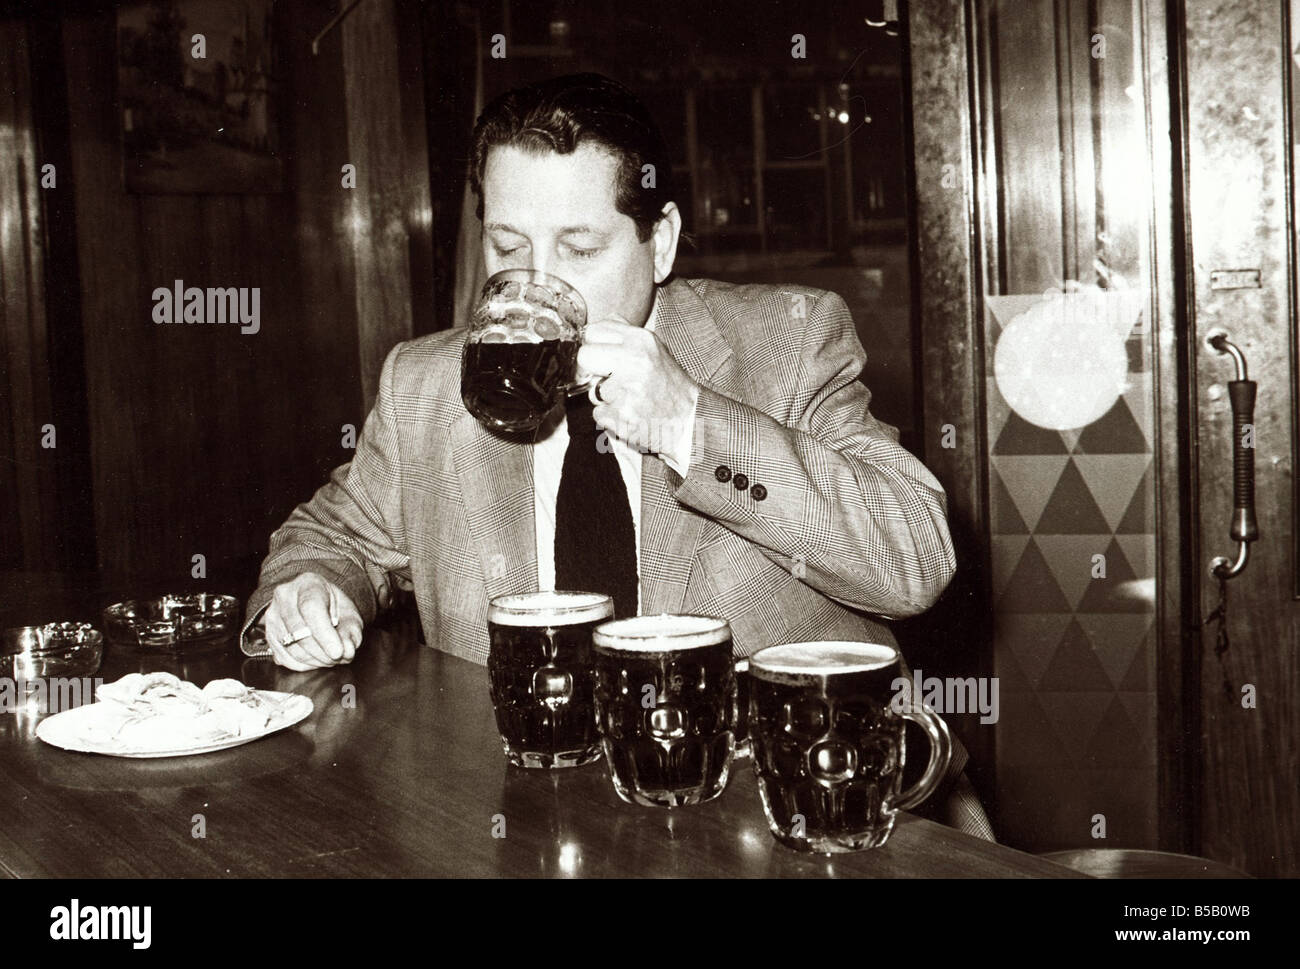 1970s Beer Stock Photos & 1970s Beer Stock Images - Alamy